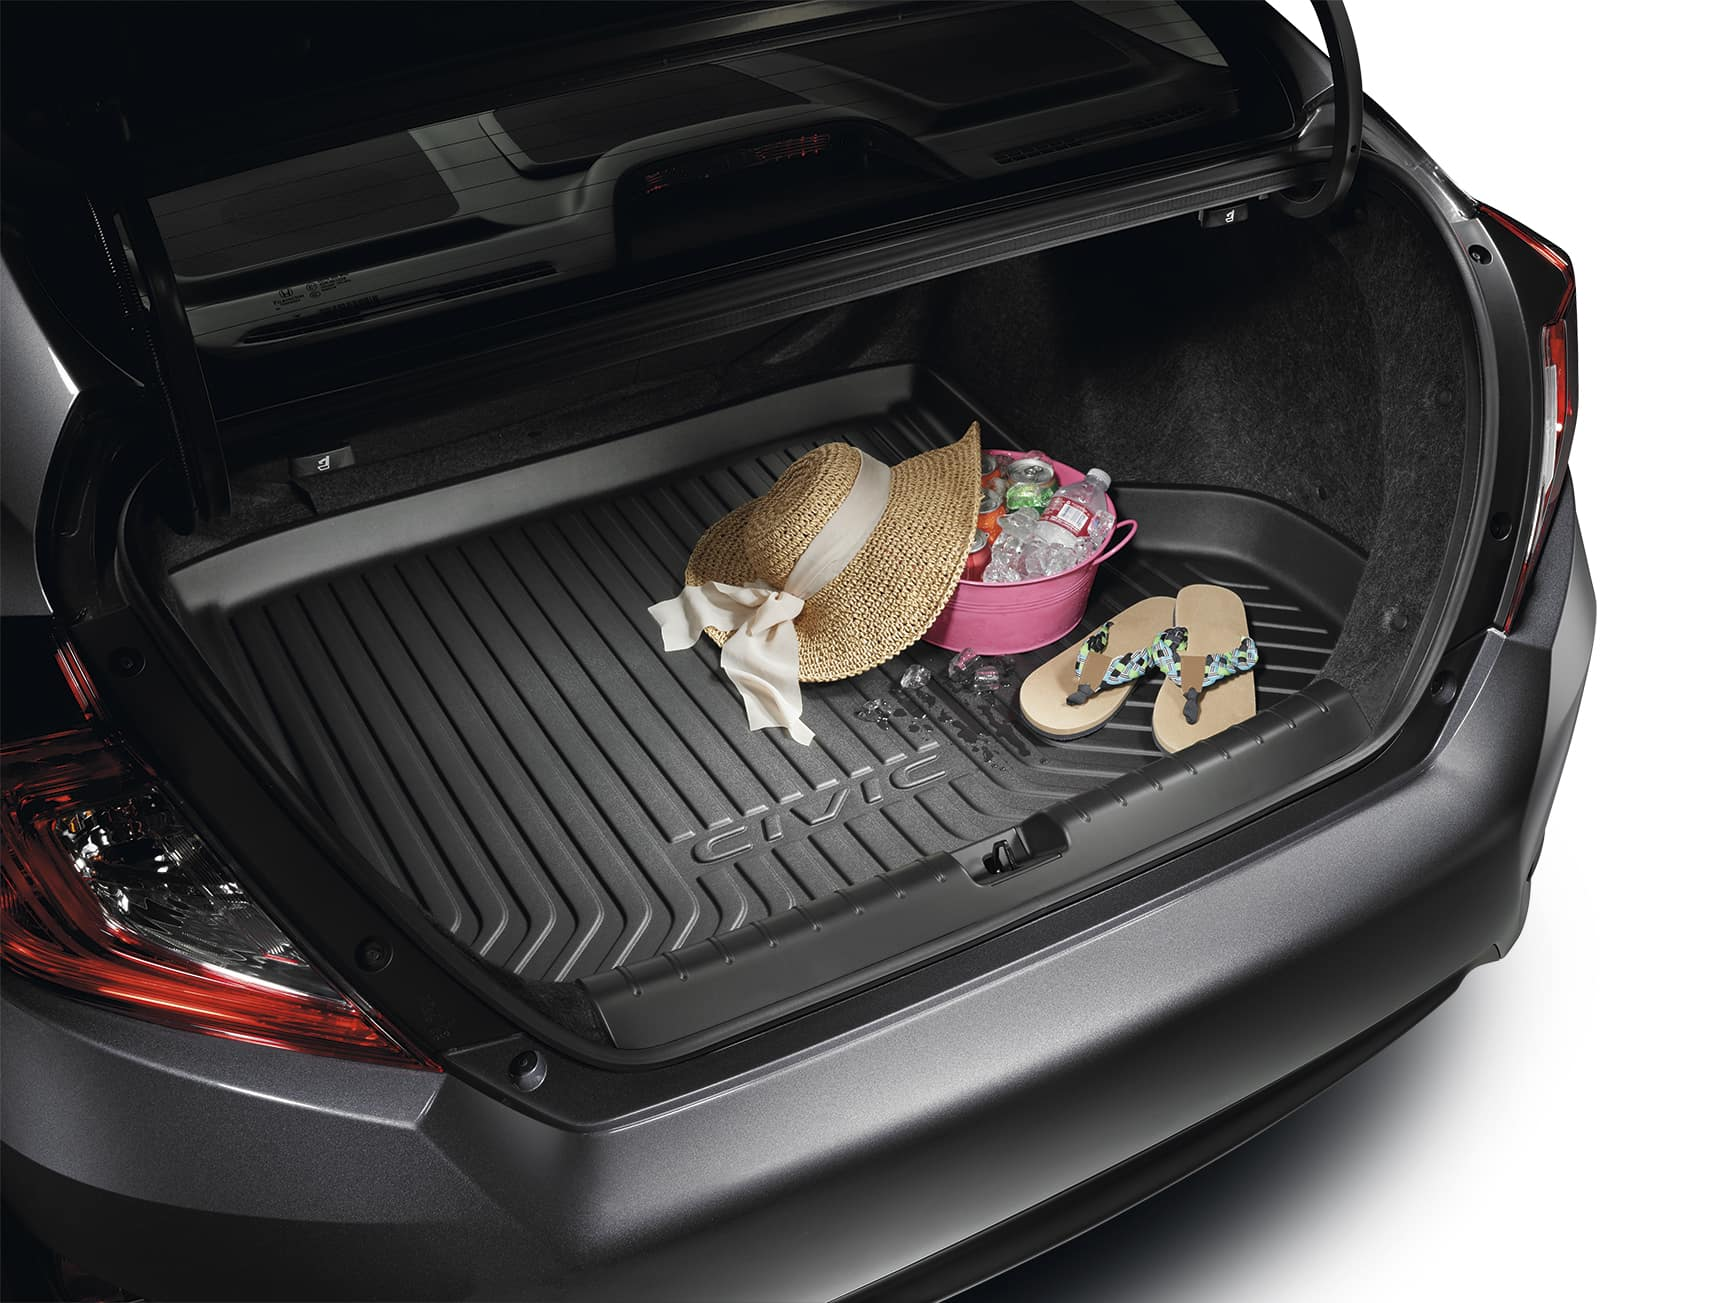 16367 cvs trunk tray bob lanphere s beaverton honda